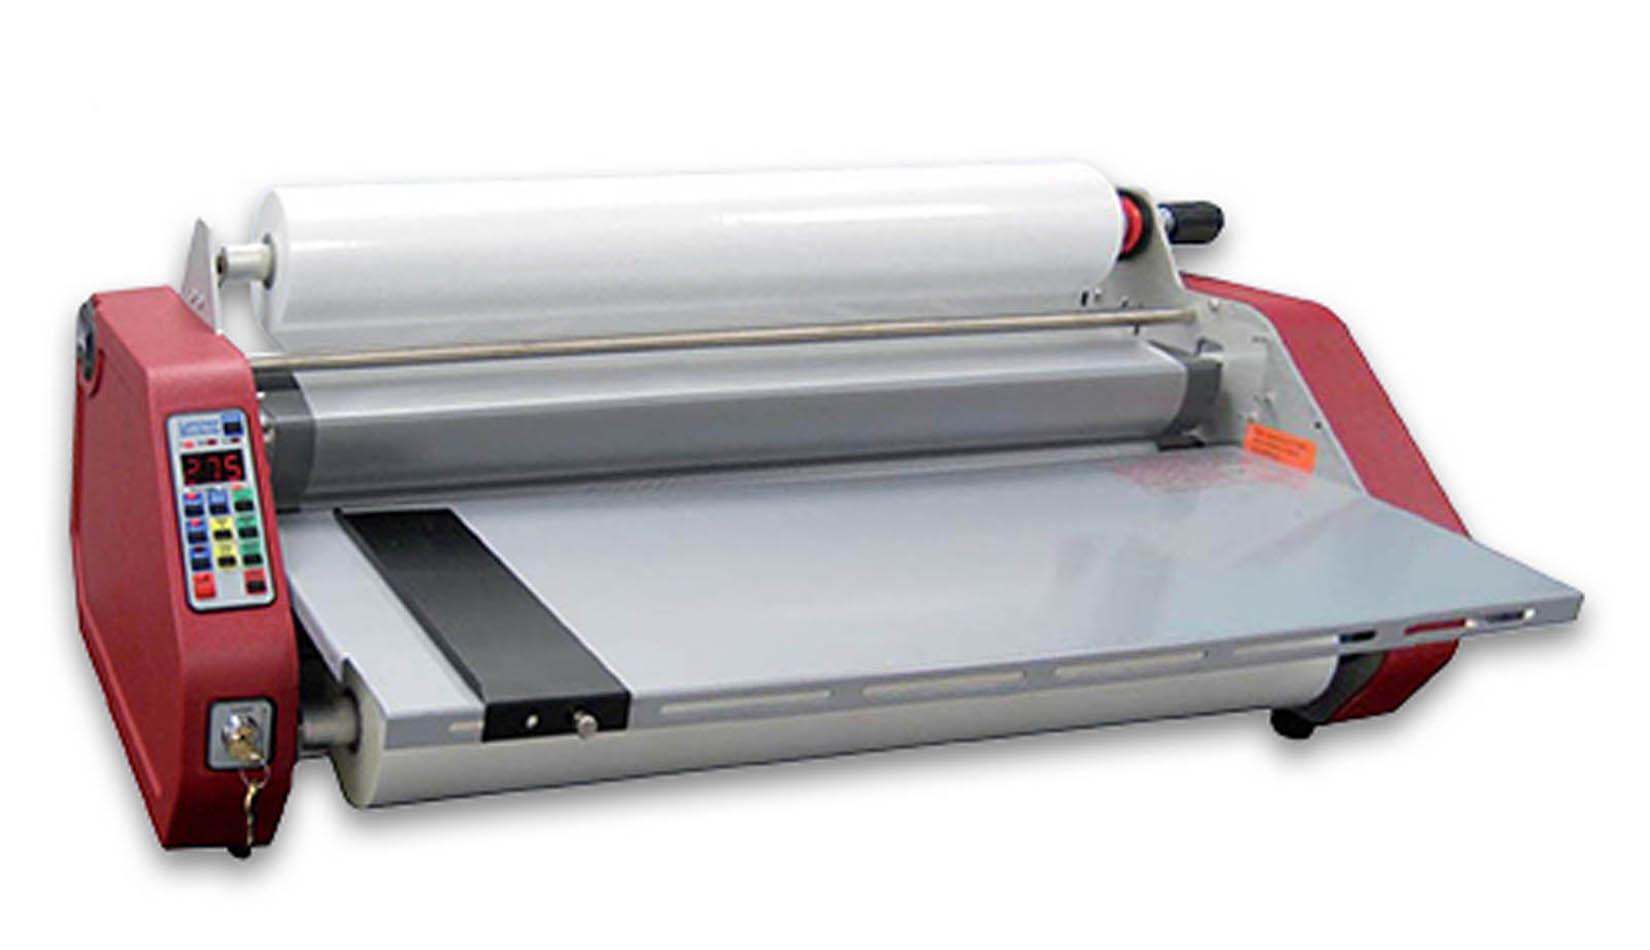 Minikote-G2 Roll Laminator